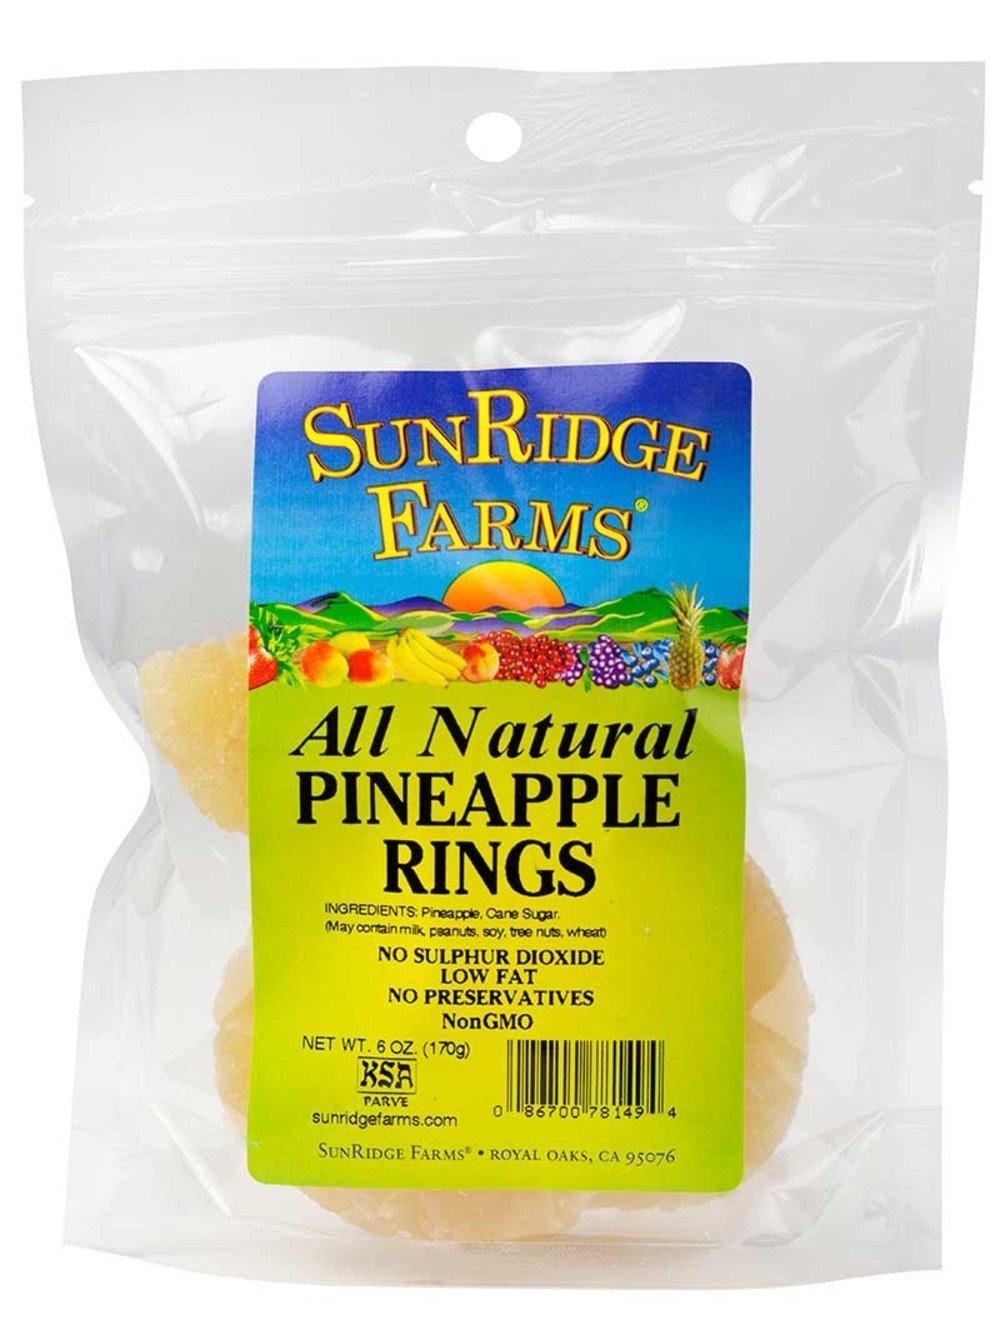 Sunridge Farms Juice-Sweetened Pineapple Rings, 6-Ounce Bags (Pack of 12)